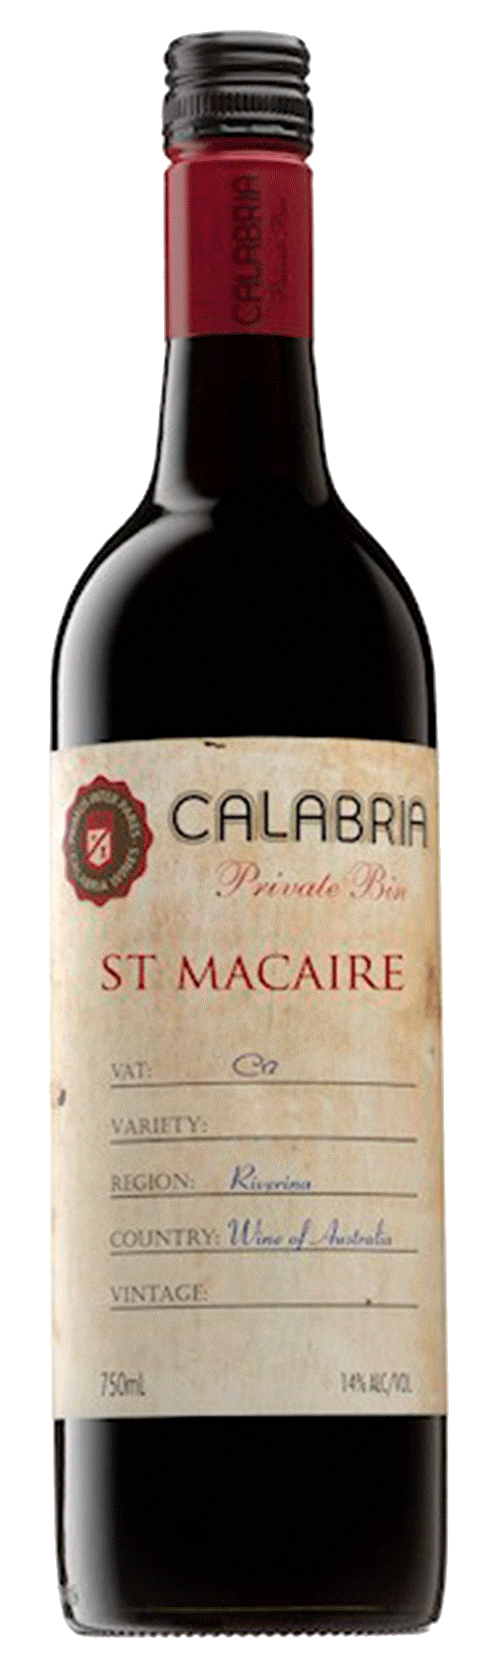 Calabria Private Bin Saint Macaire 2013